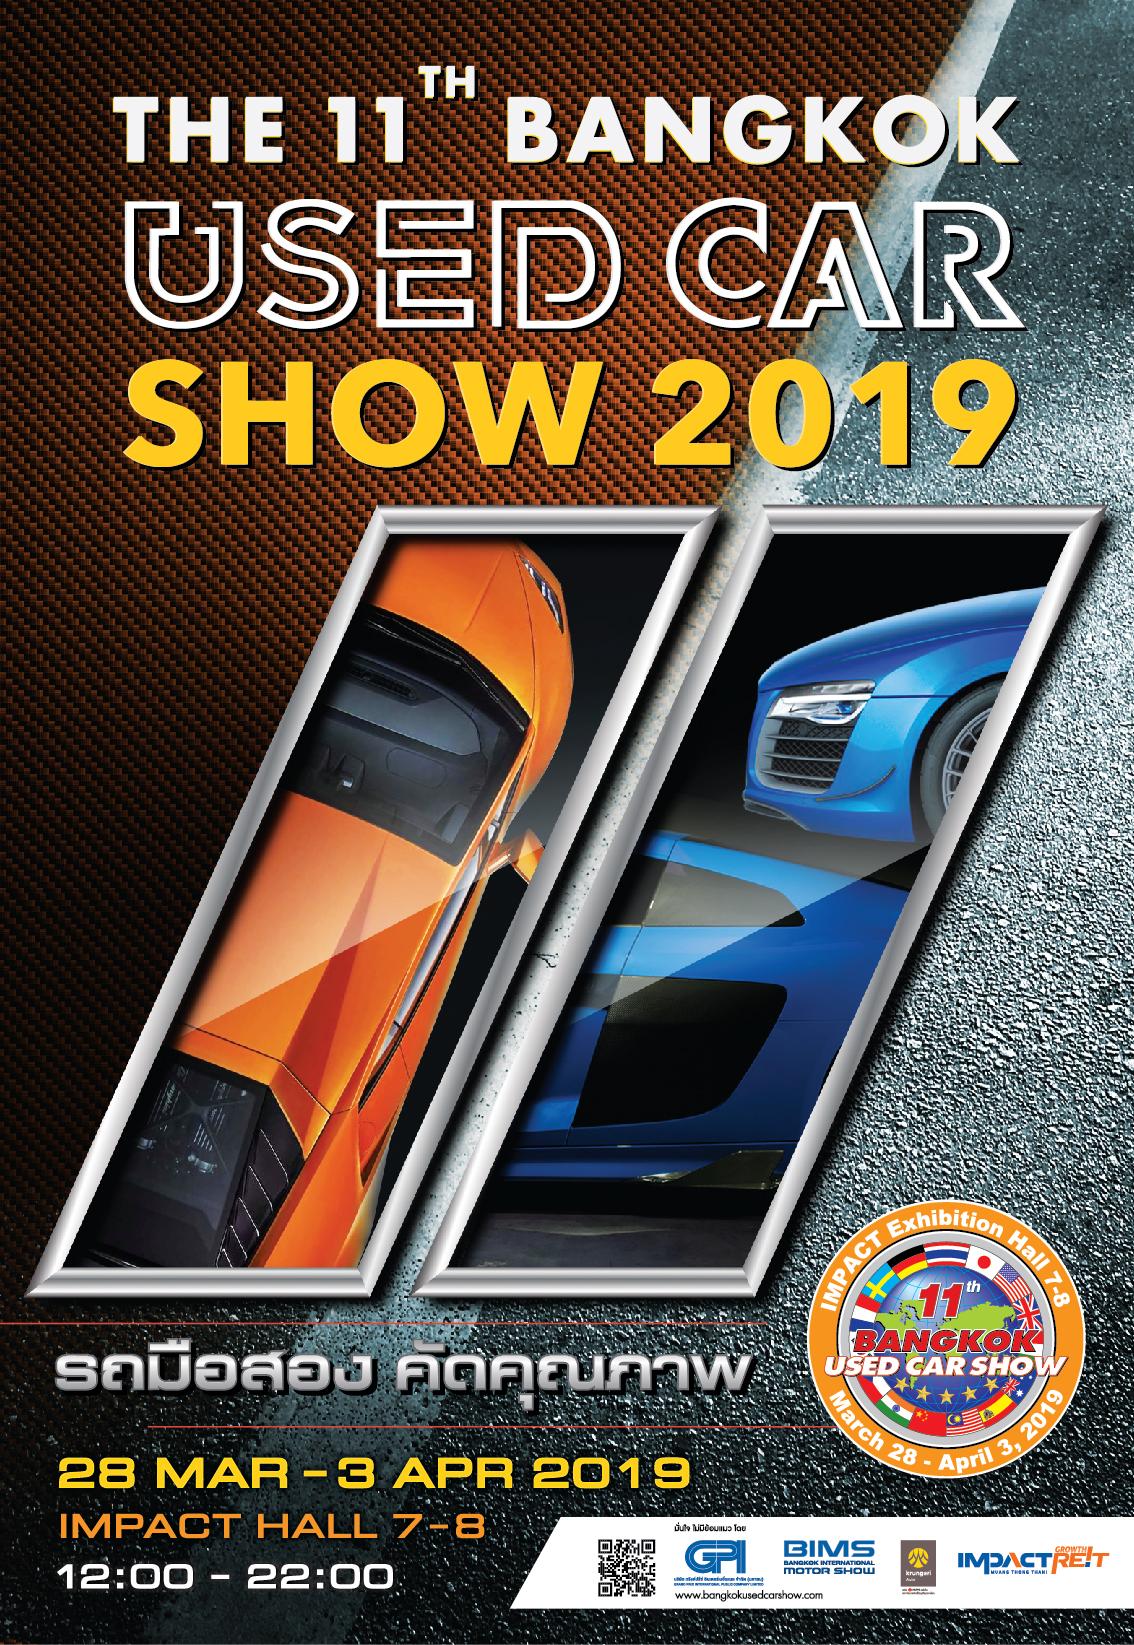 The 11th Bangkok Used Car Show 2019